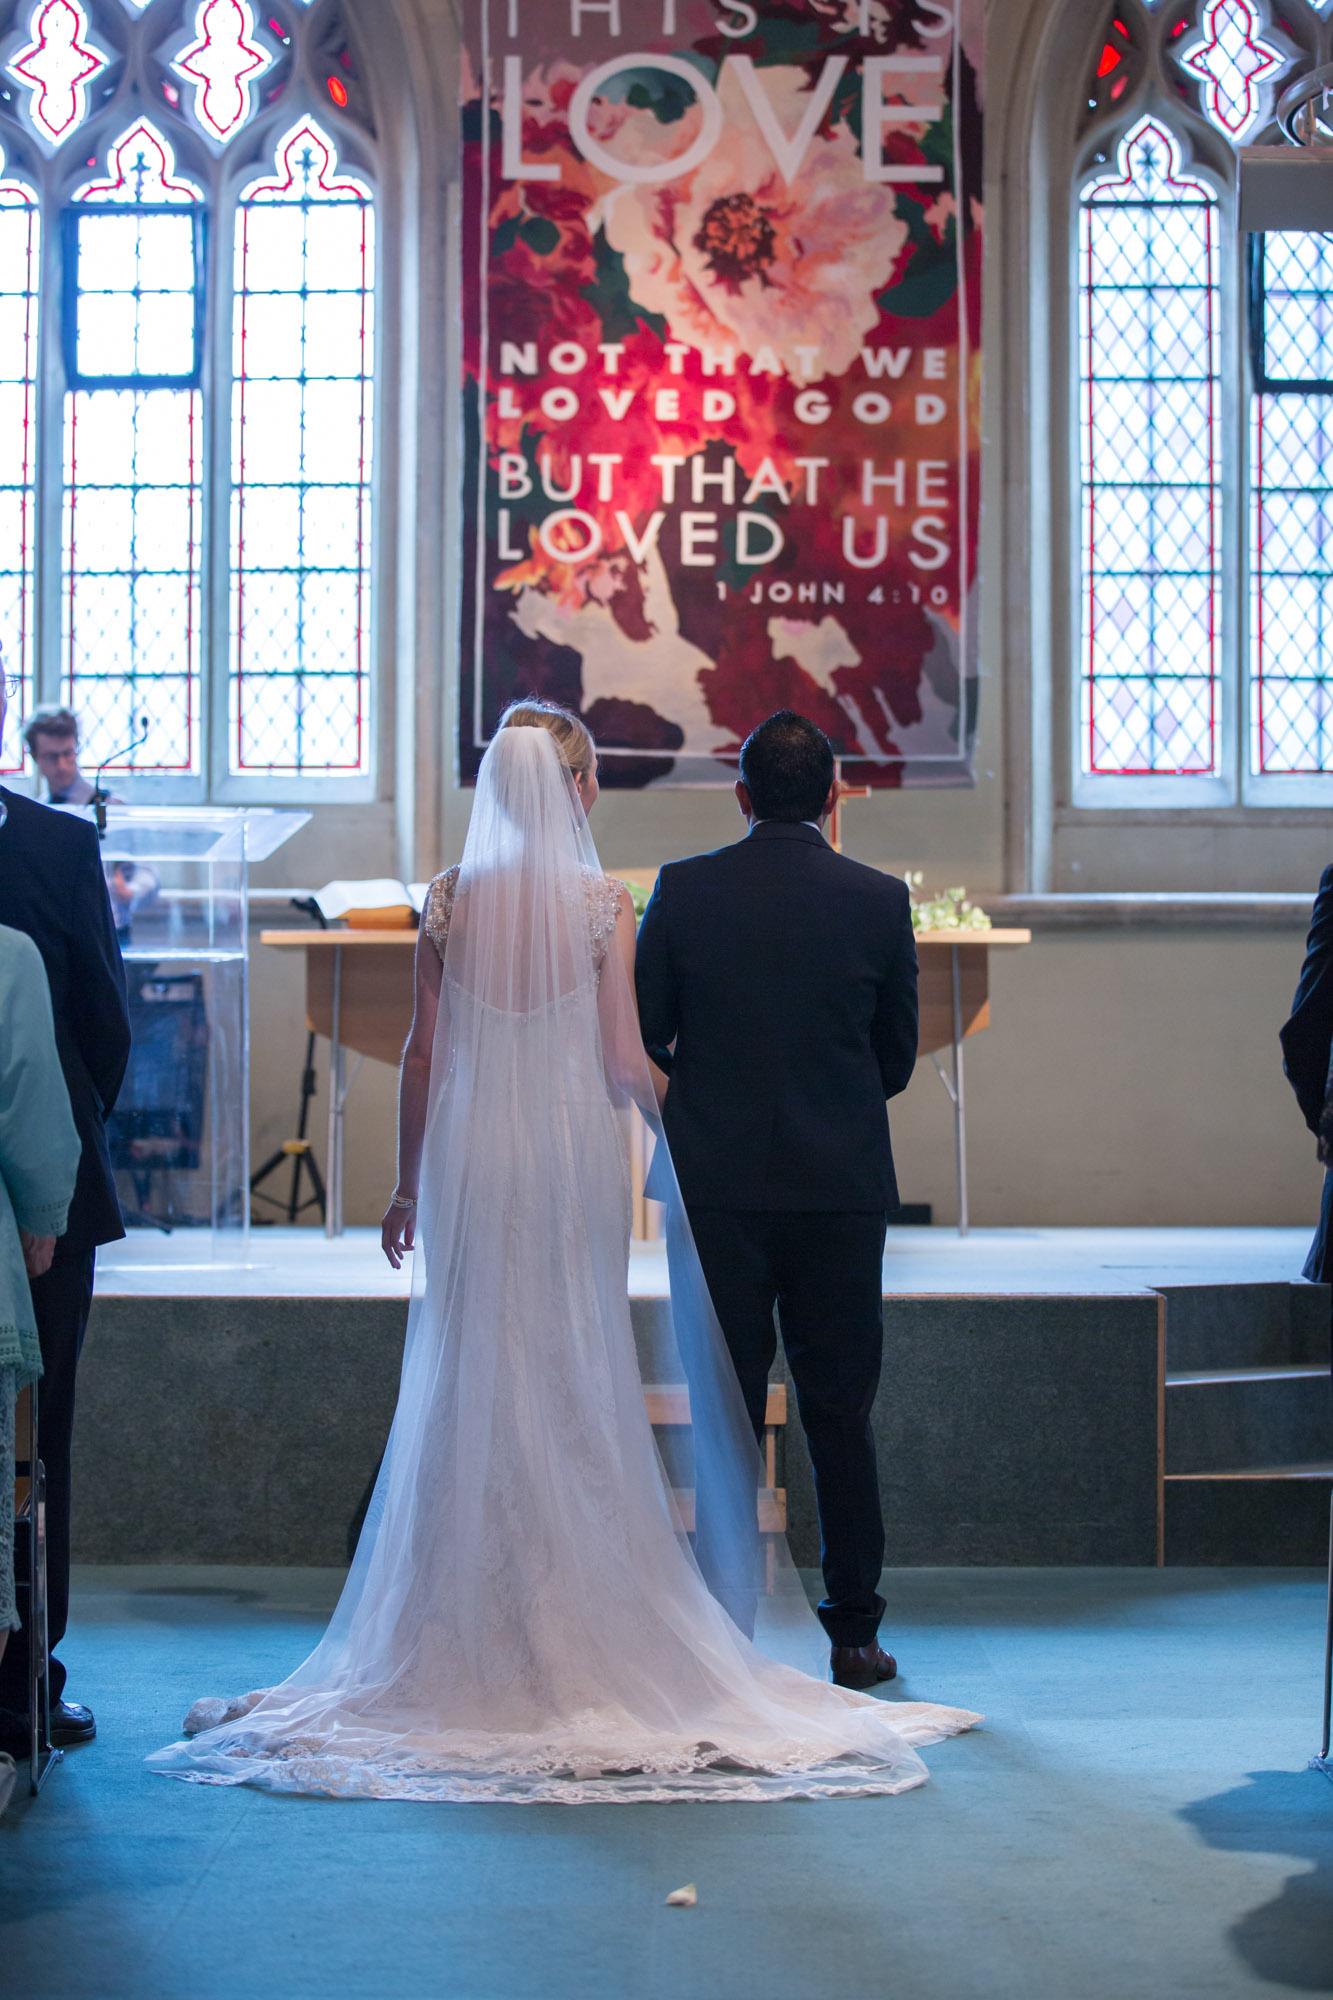 weddings-couples-love-photographer-oxford-london-jonathan-self-photography-30.jpg